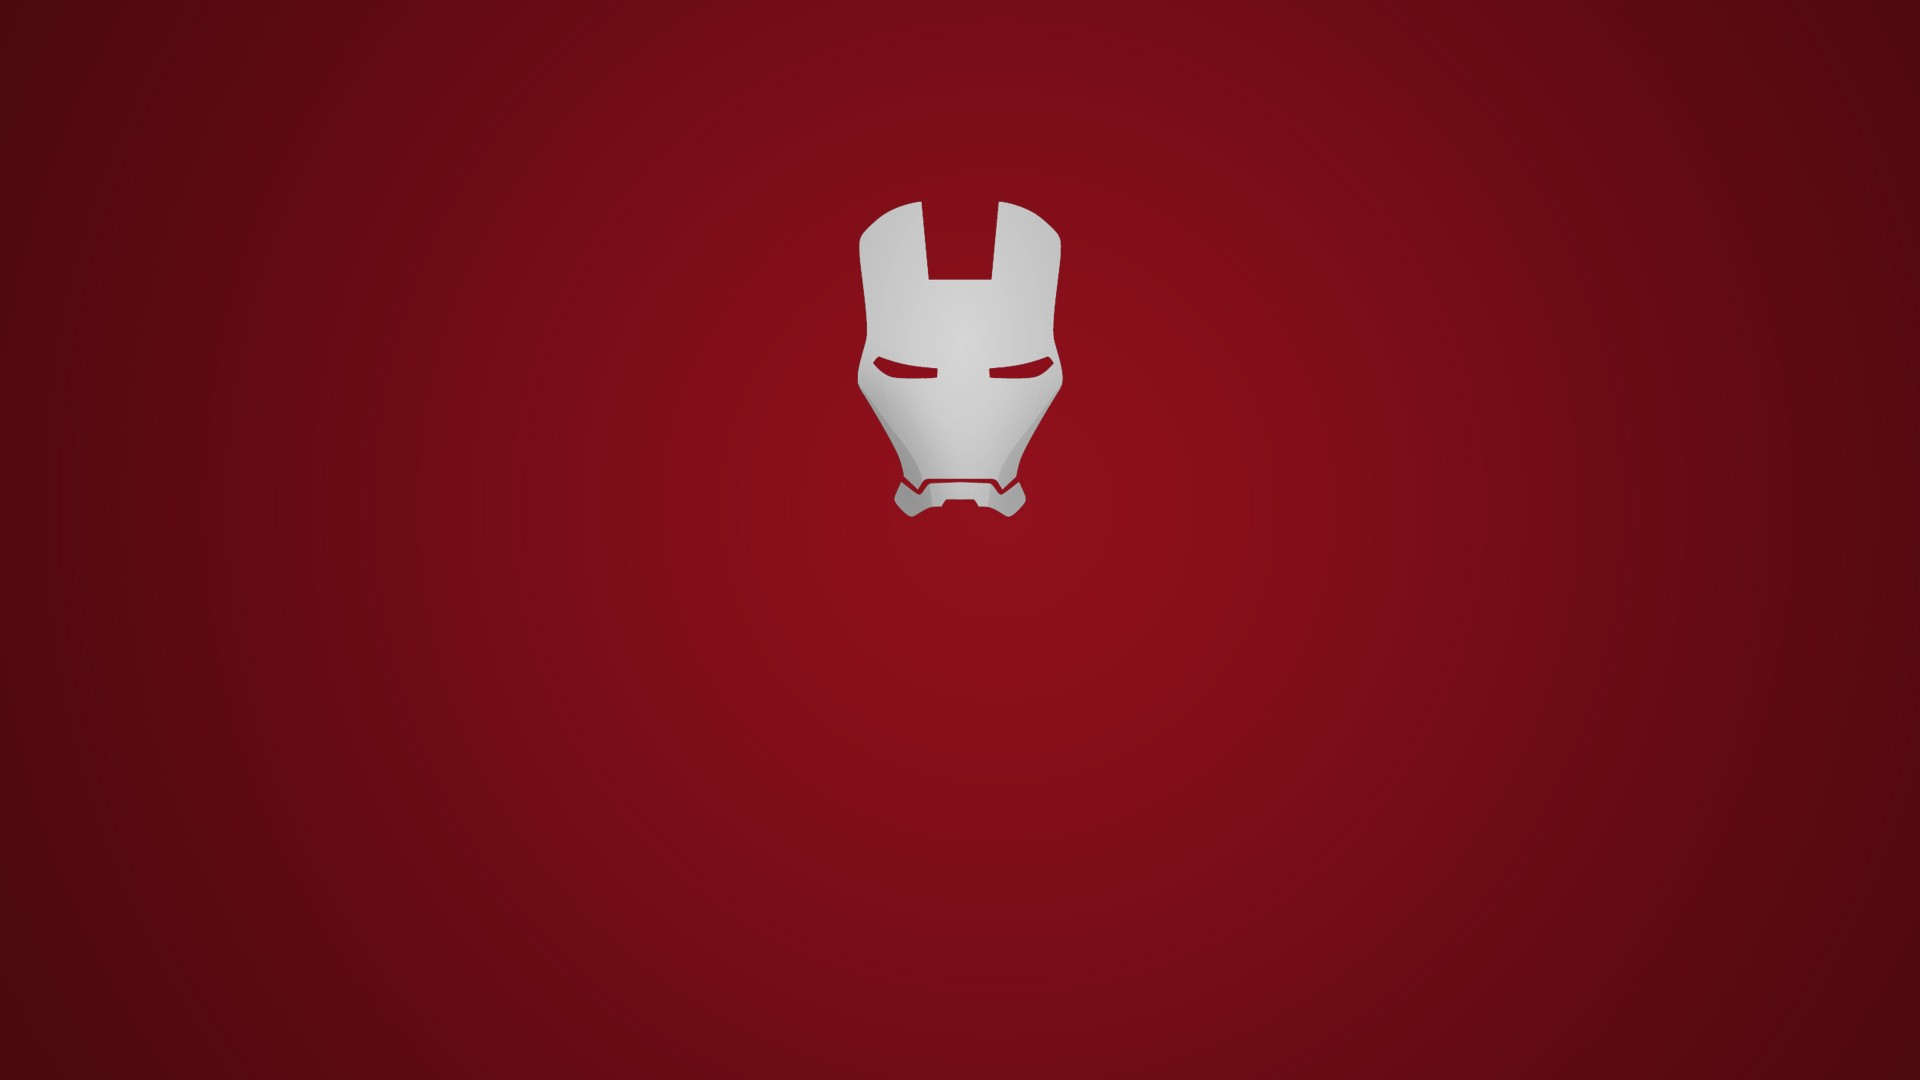 iron man mask desktop wallpaper 62758 64744 hd wallpapers